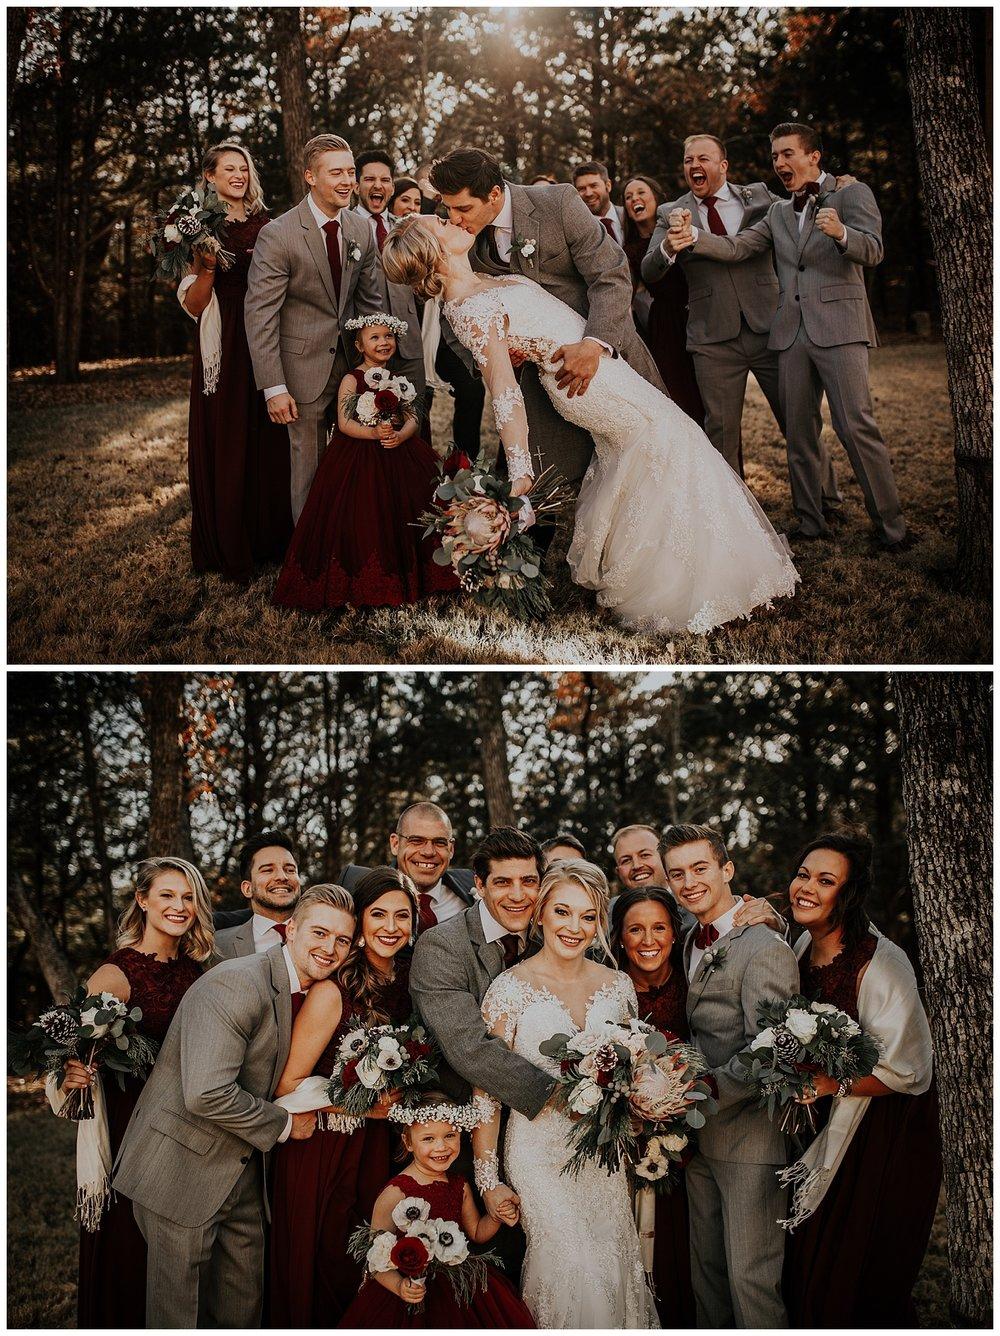 Laken-Mackenzie-Photography-Palm-Whispering-Oaks-Wedding-Venue-Dallas-Wedding-Photographer24.jpg